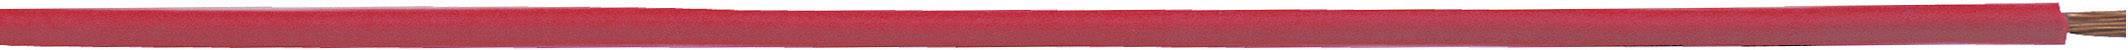 Opletenie / lanko LappKabel 4510052S H05V-K, 1 x 0.75 mm², vonkajší Ø 2.70 mm, 250 m, biela